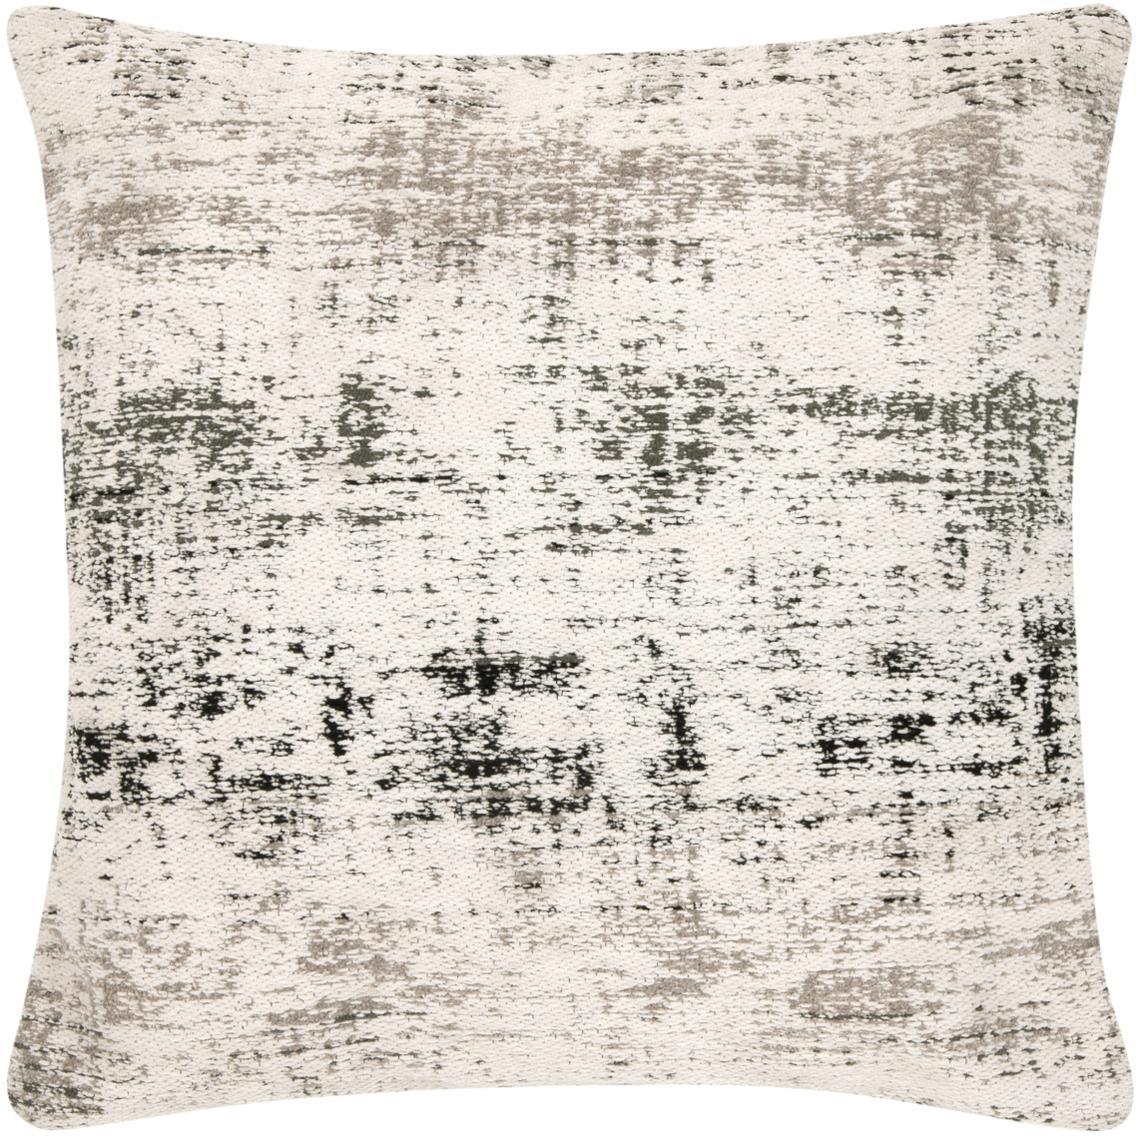 Kussenhoes Corinne, Crèmewit, zwart, grijs, 45 x 45 cm